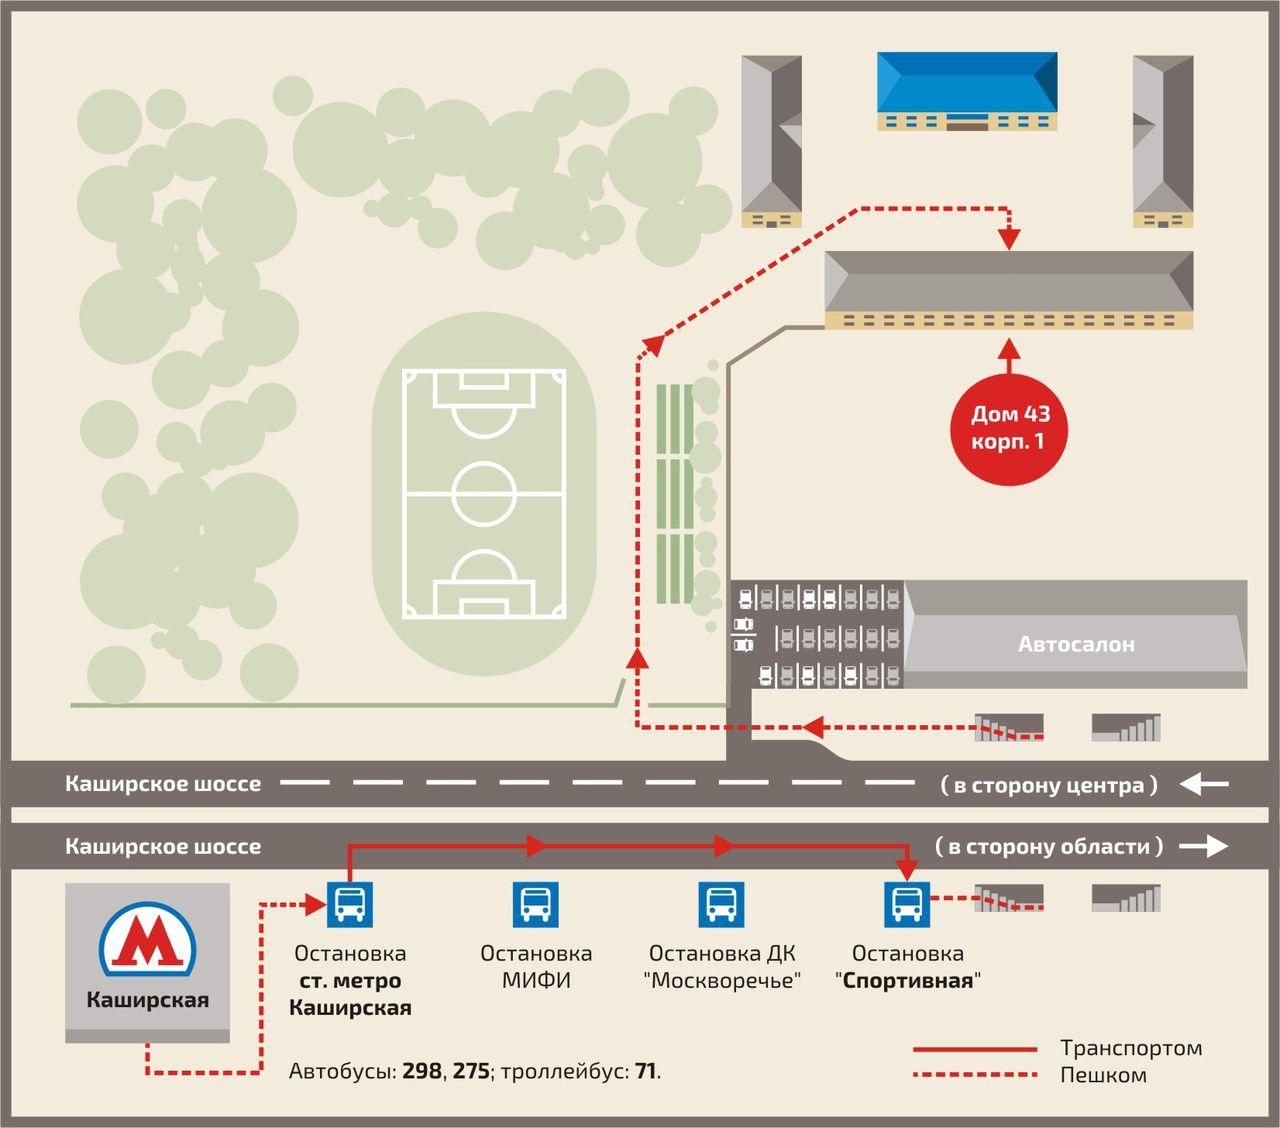 Схема онкологического центра на каширке